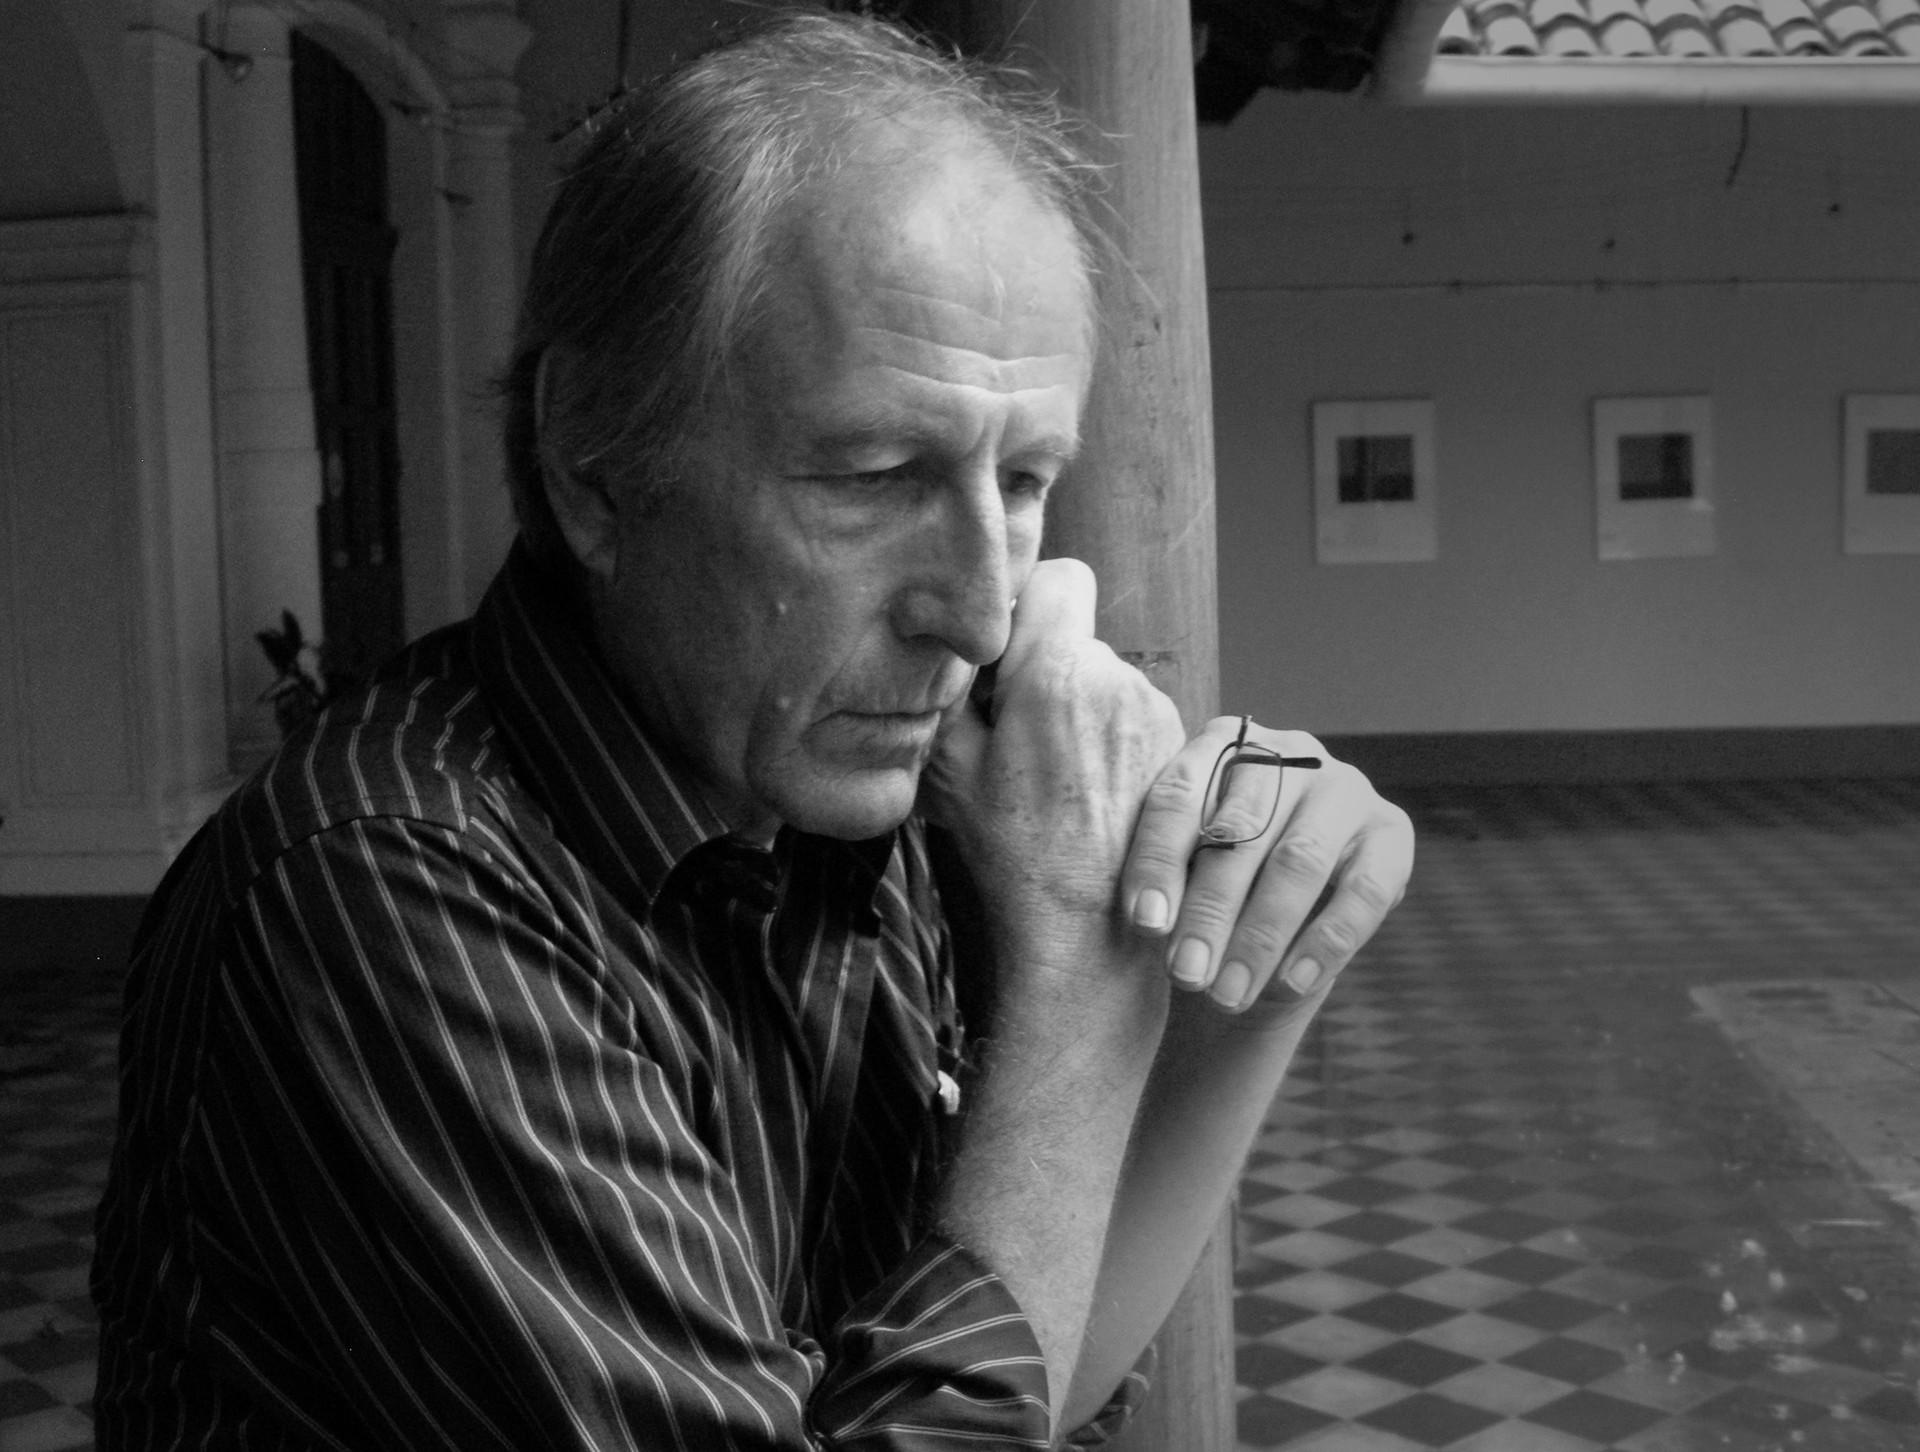 Dieter Stadler, Director, Casa de los Tres Mundos, Granada, Nicaragua